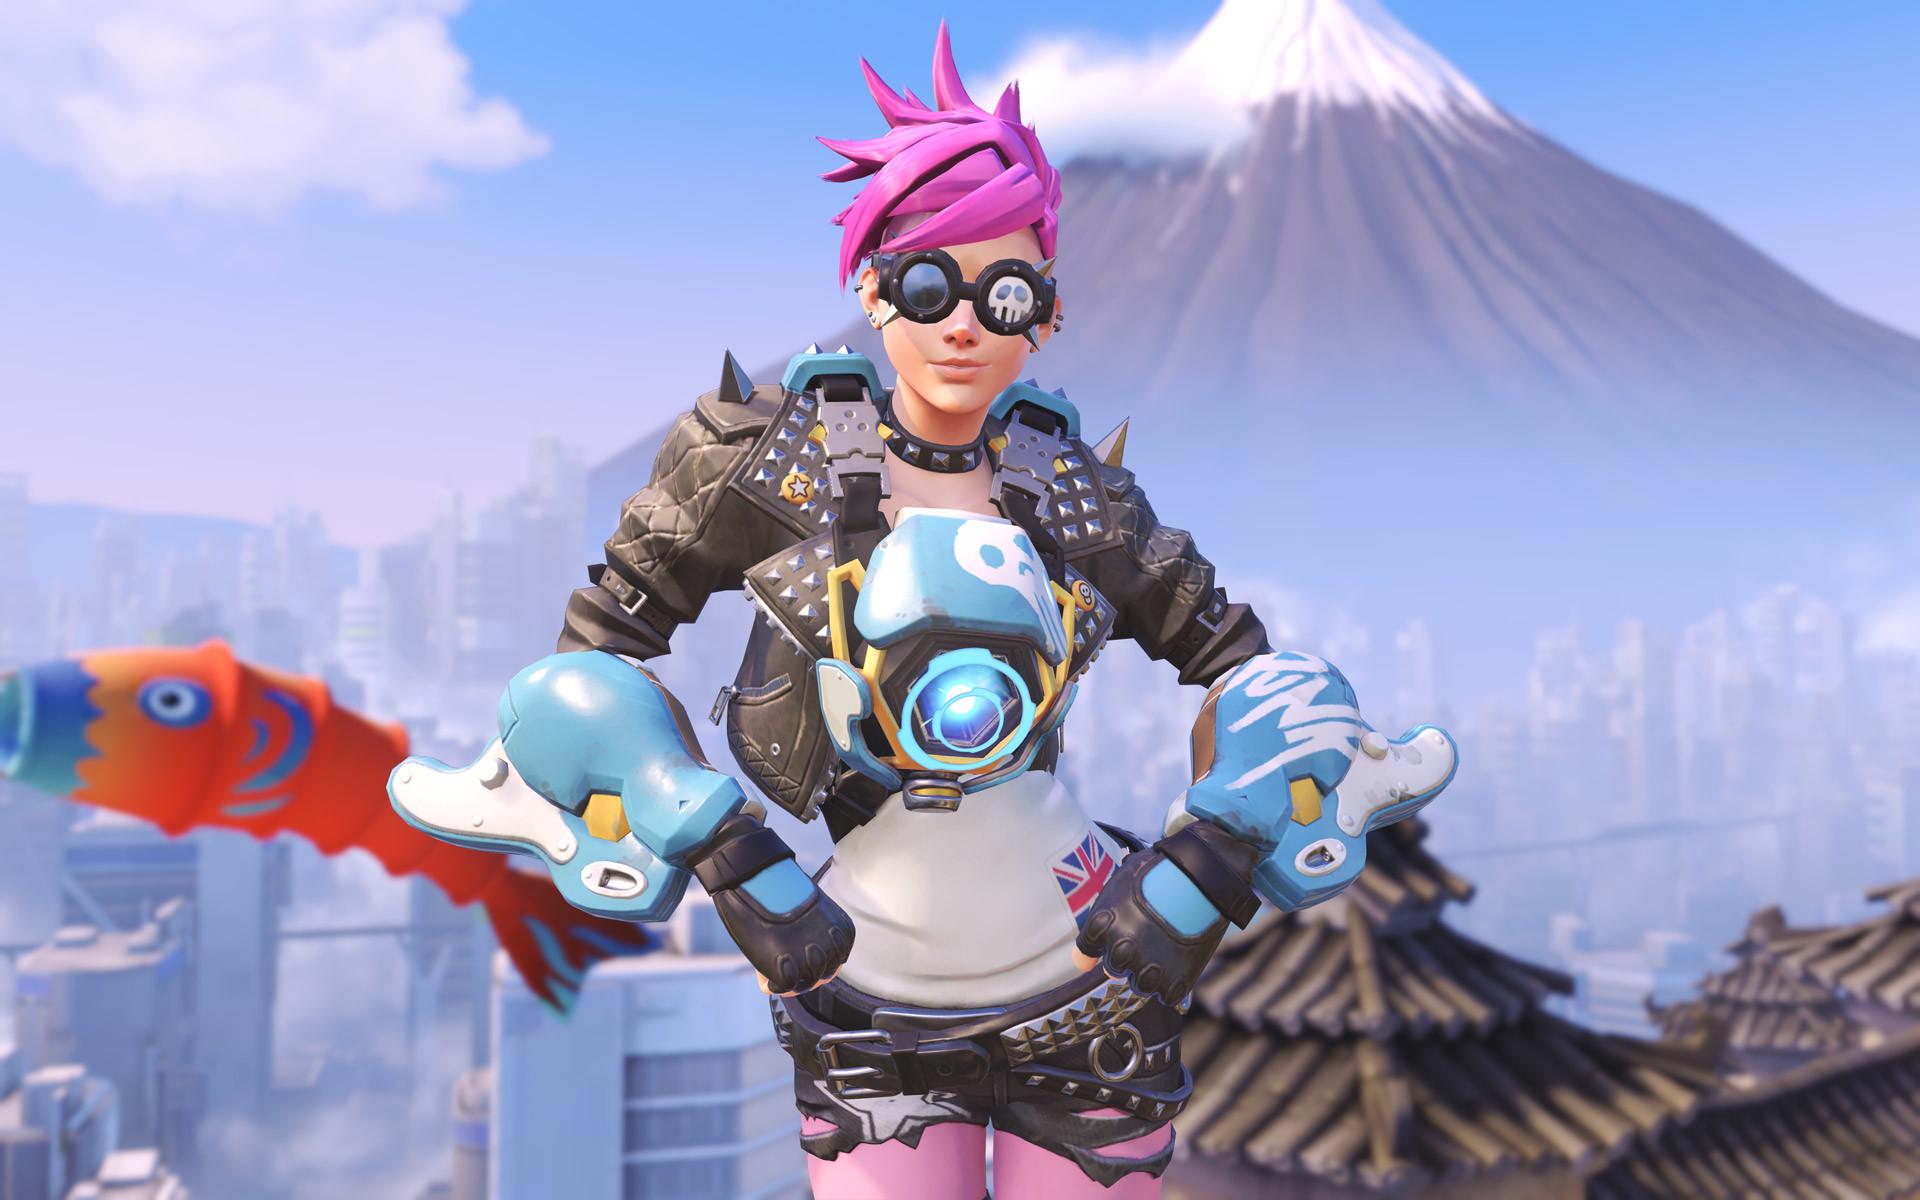 Punk Tracer skin in Overwatch on Hanamura backdrop